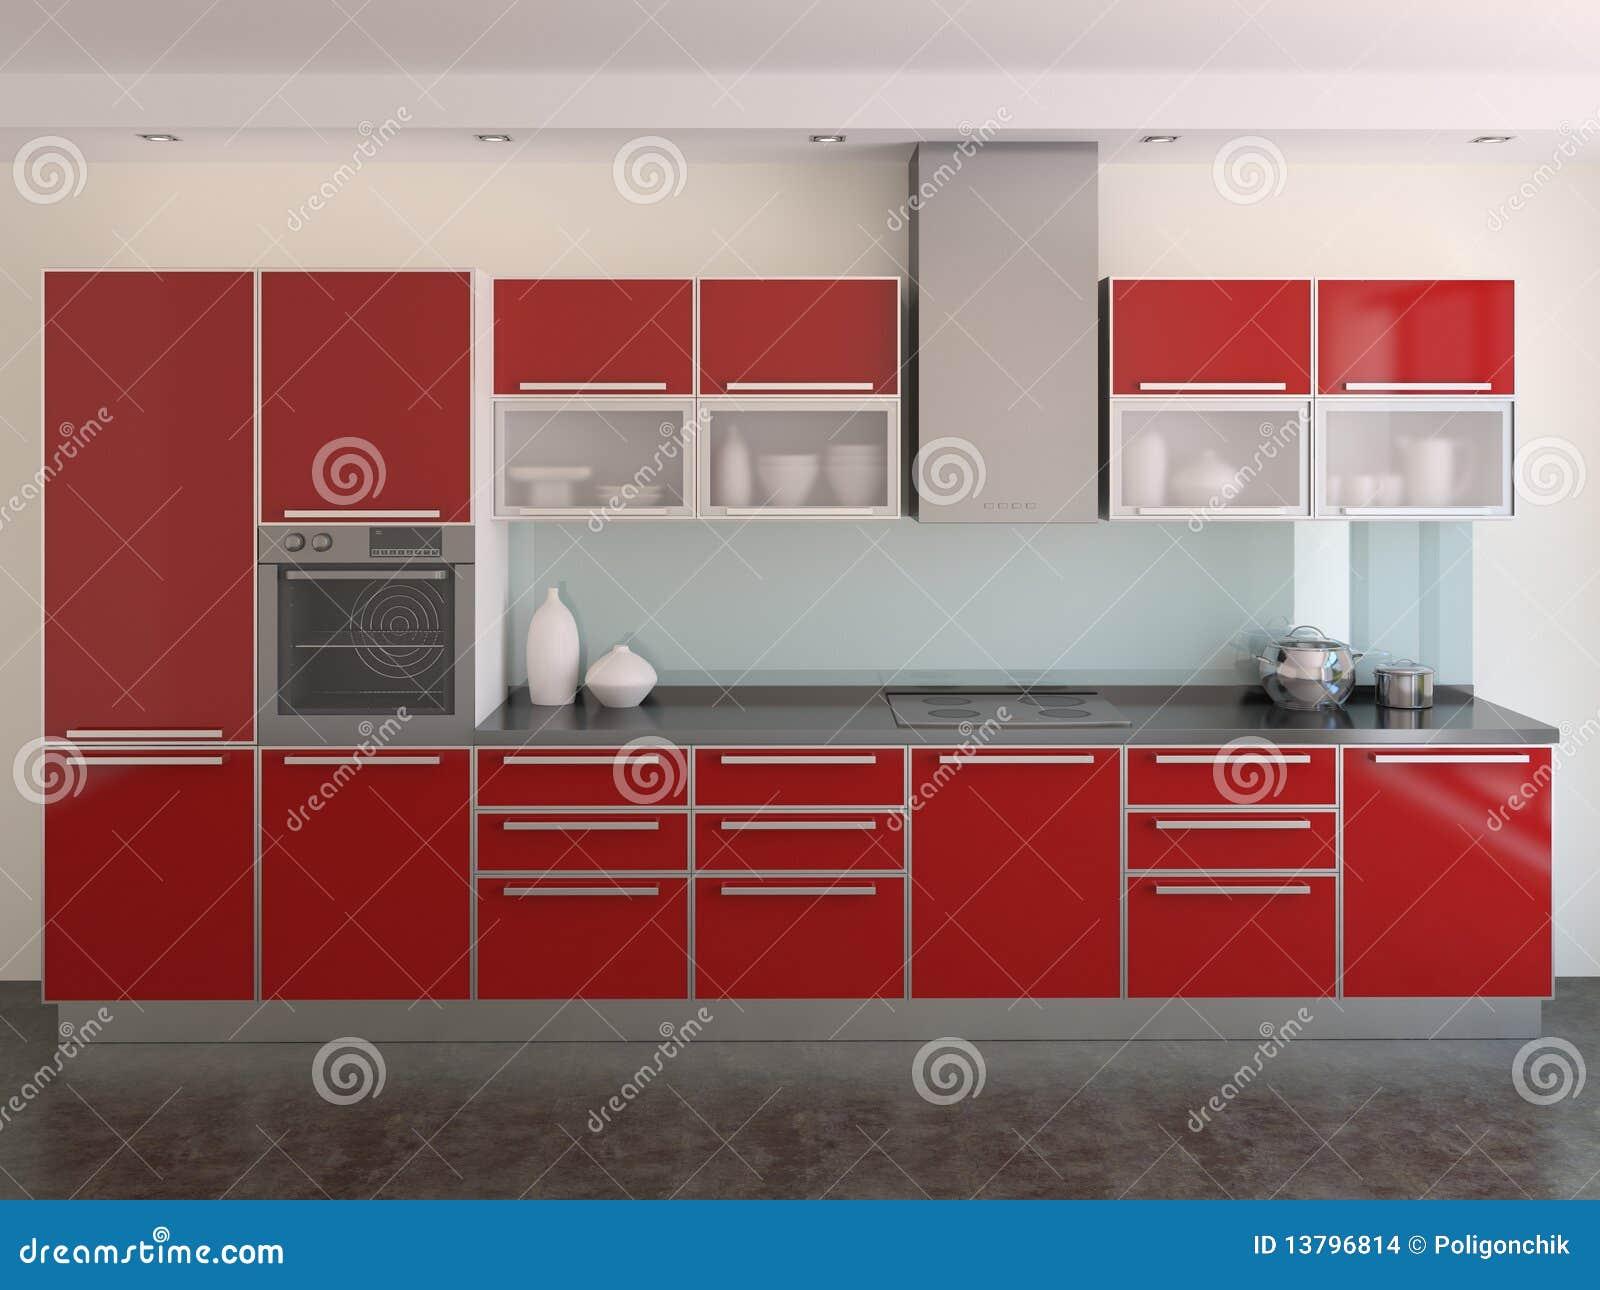 Modern red kitchen stock photo image of render interior 13796814 - Aardewerk rode keuken ...